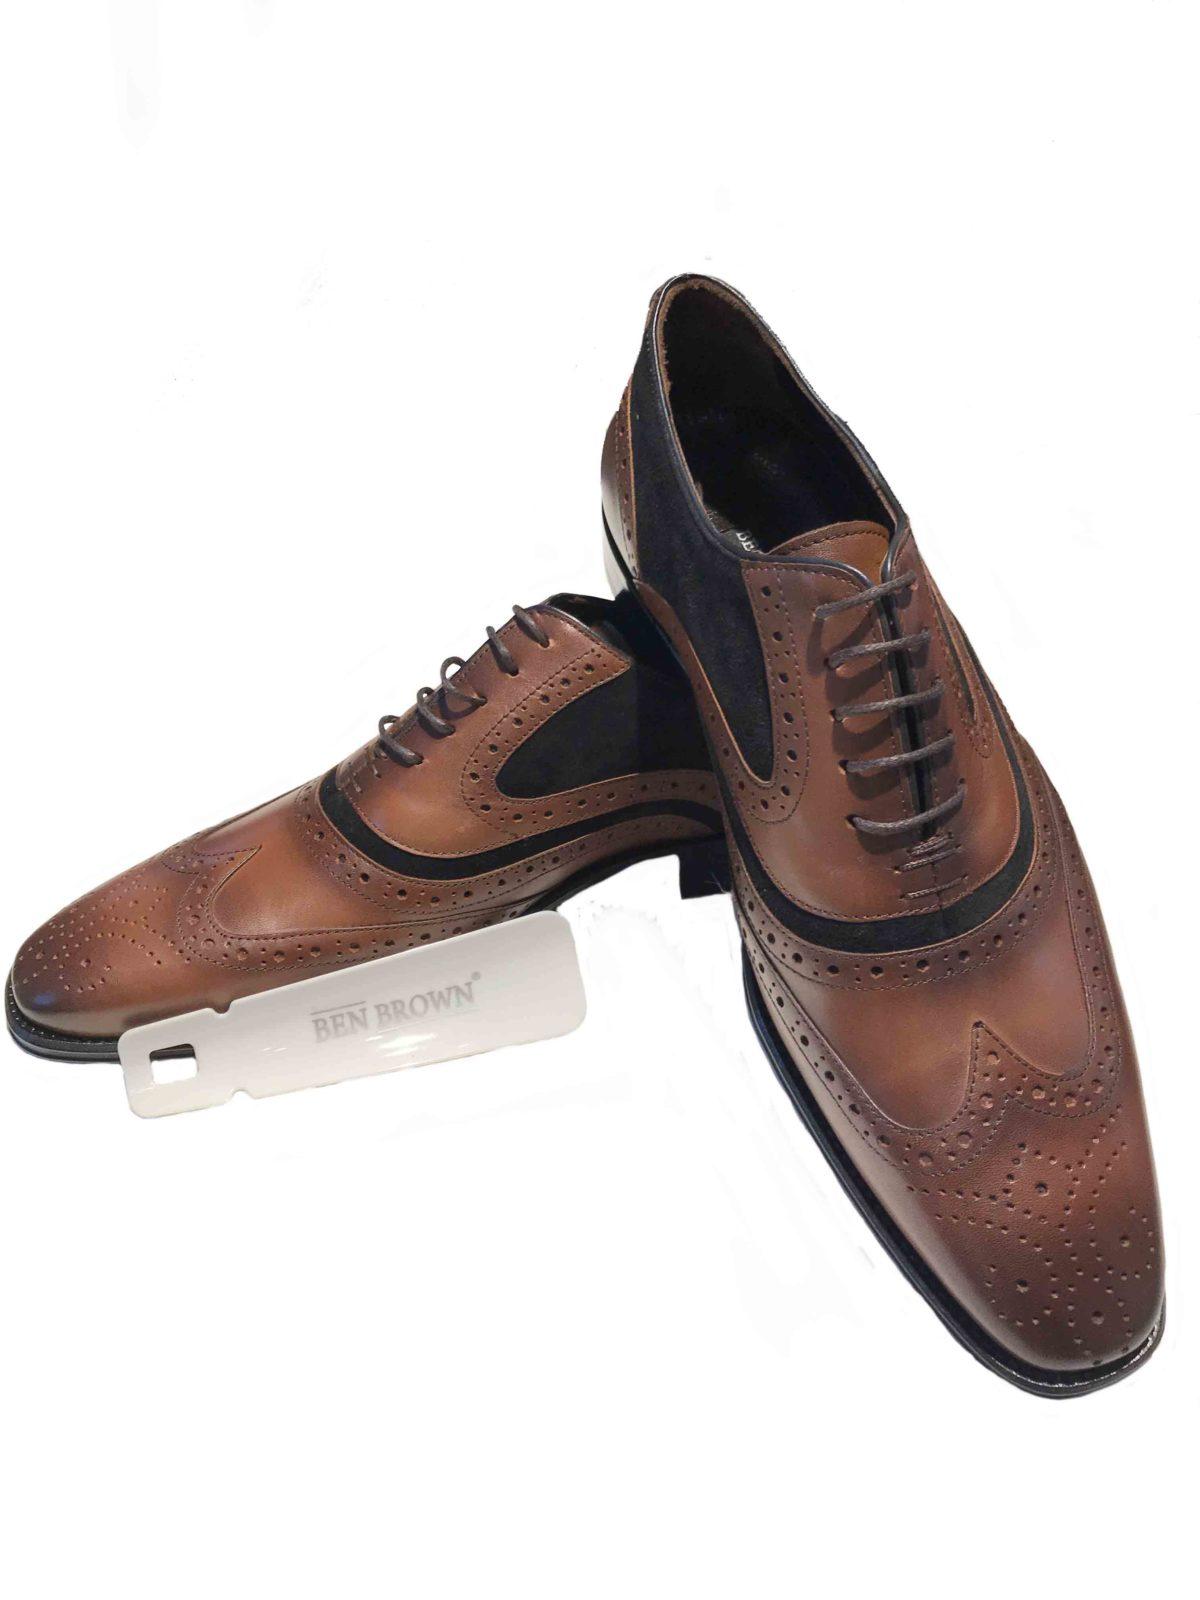 Ben Brown |BB 1168-9 Brown & black shoe